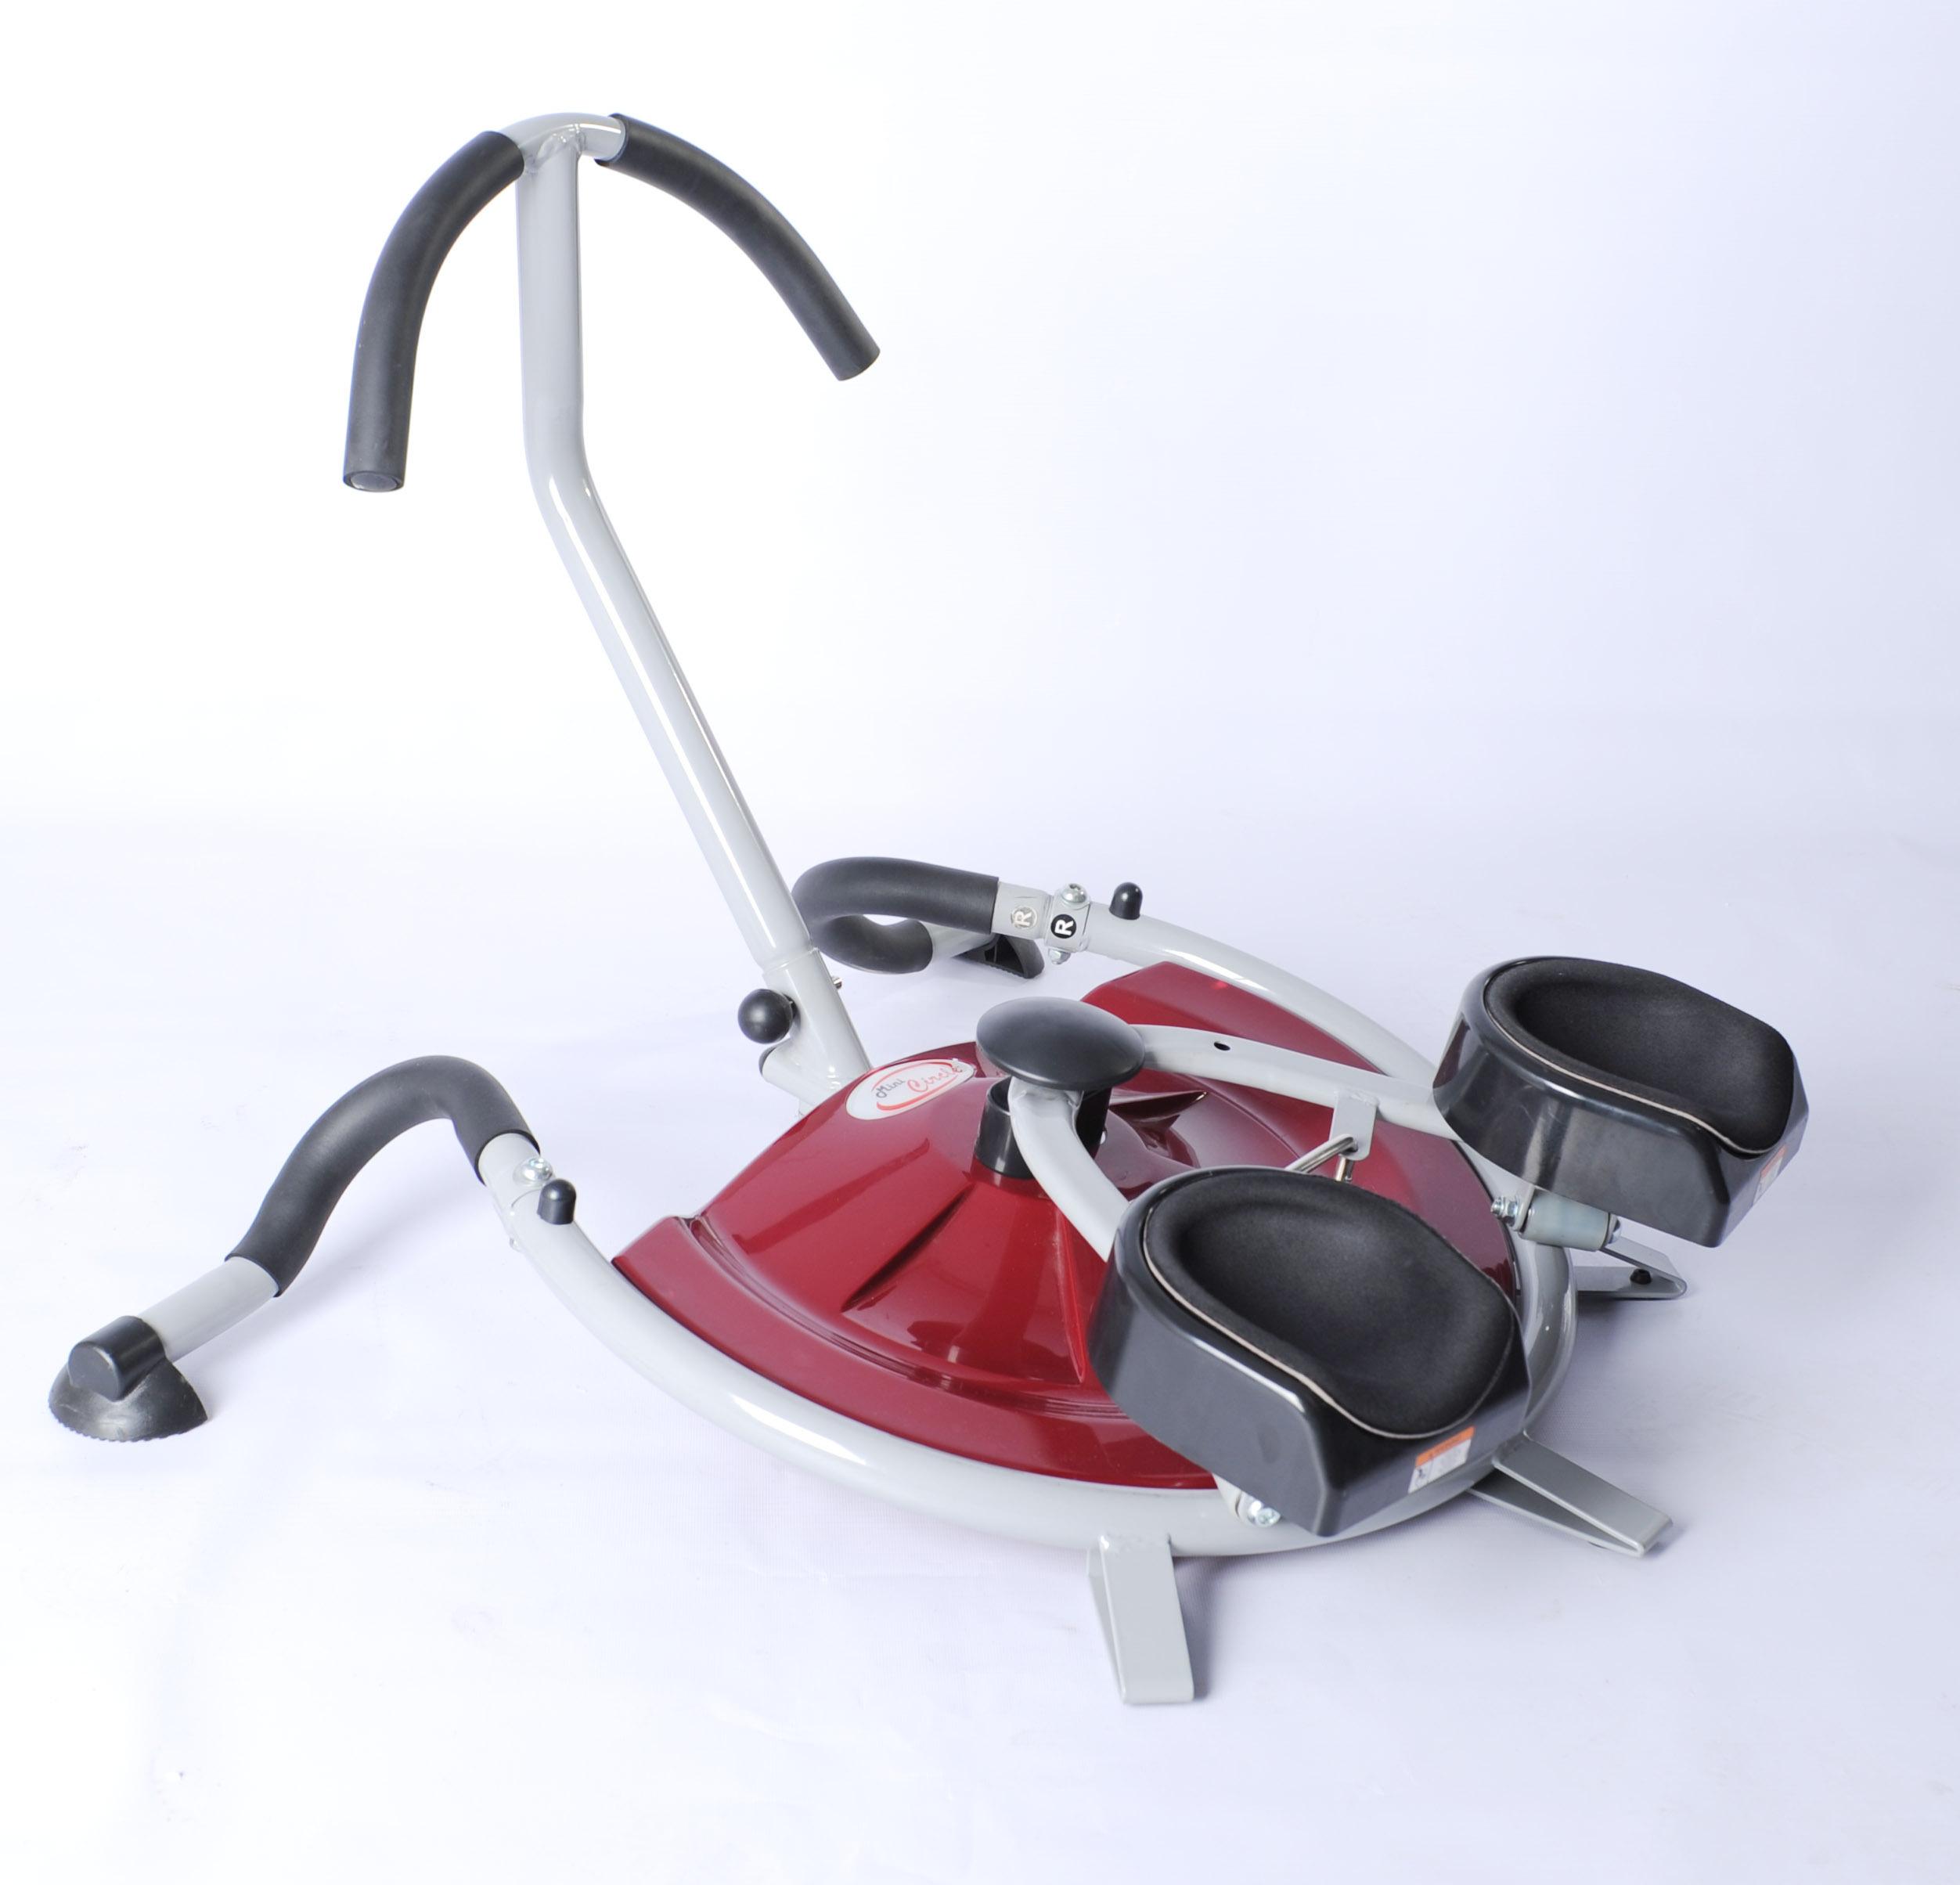 тренажер для ног Фабрика выход мини поворотный талии/американский живота мини-AB circle Pro для 3 поколений